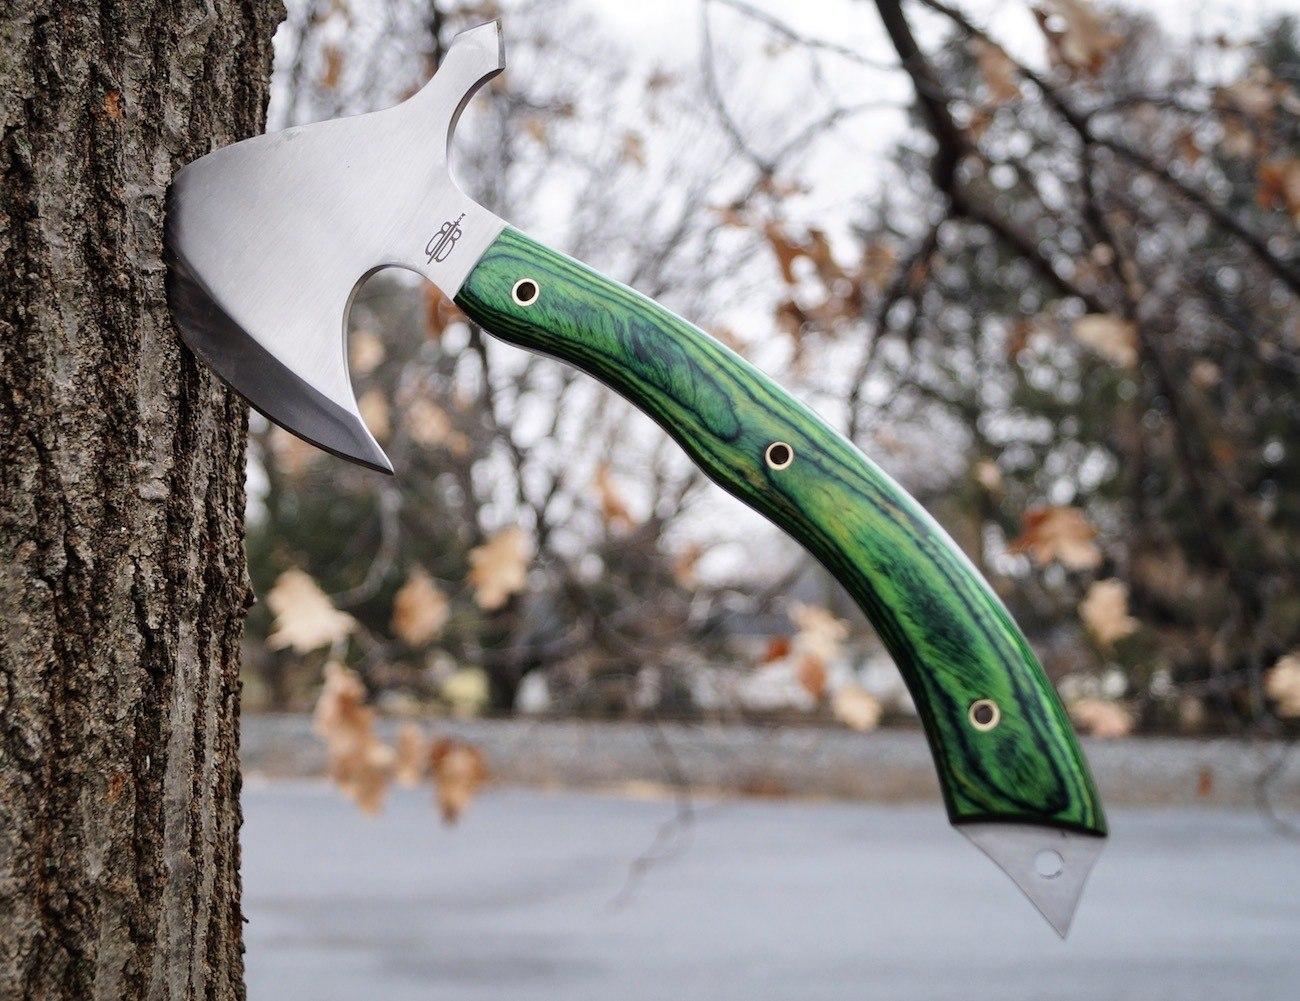 BucknBear Survival Tomahawk Axe Knife